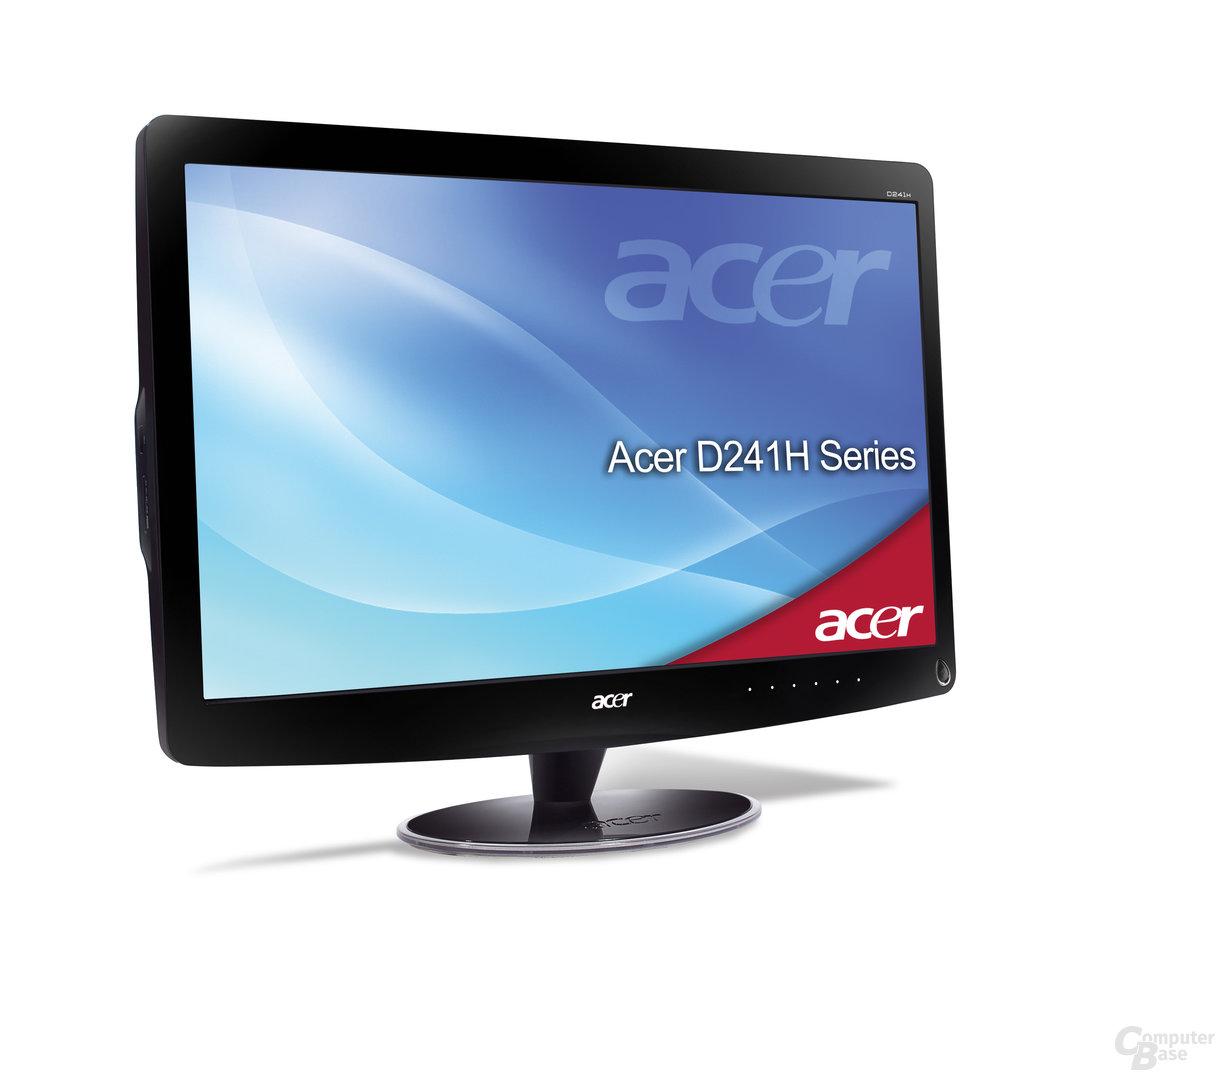 Acer D241H